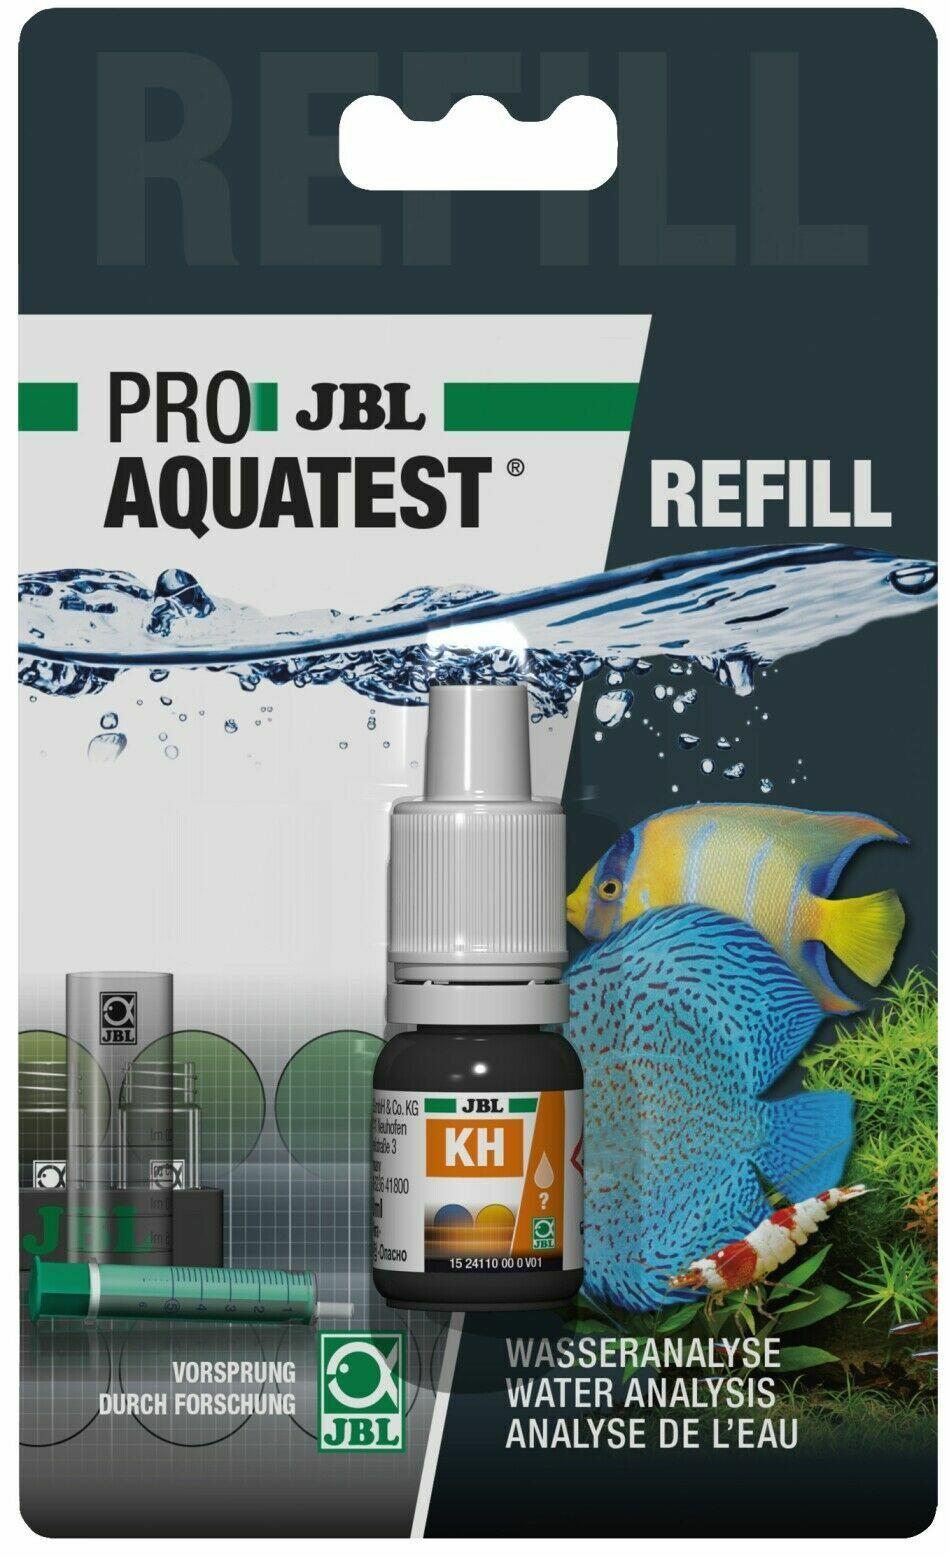 JBL KH Test Reagens (Refill) Wassertest Karbonathärte Aquarium + Teich   33627